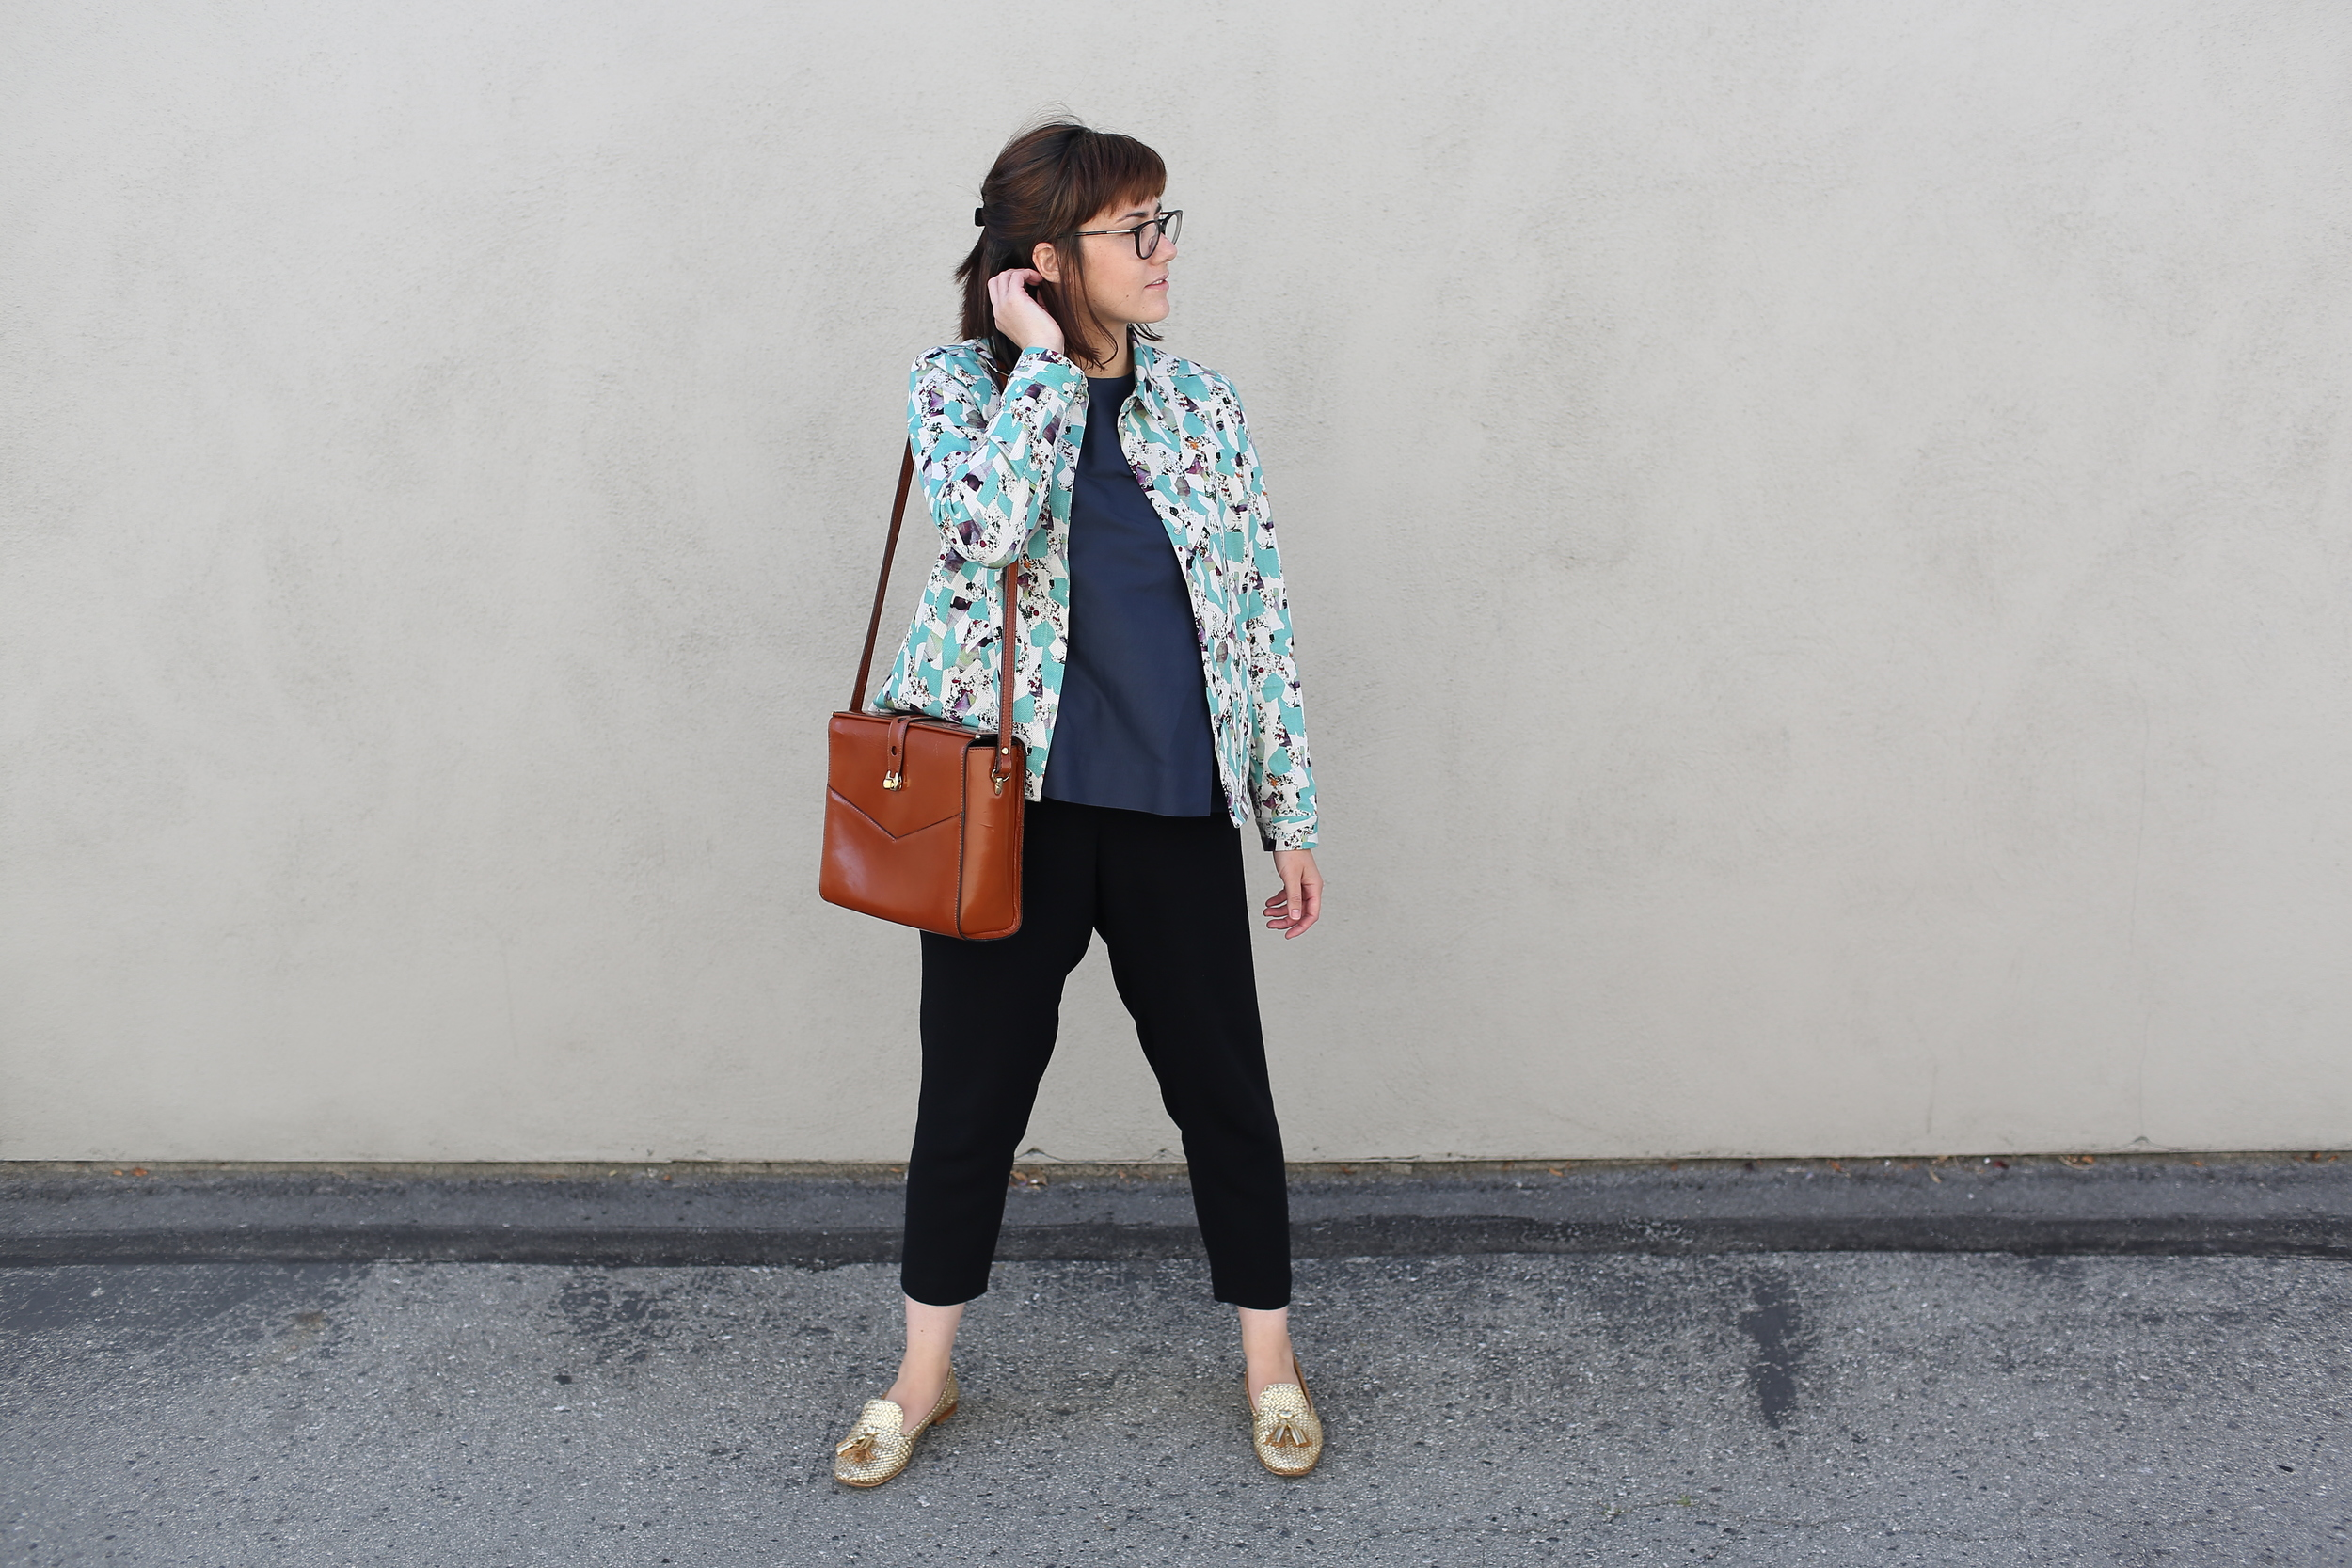 Jacket: COS (similar  here ); Blouse: COS (similar  here ); Pants: Jigsaw London (similar  here ); Metallic Loafers: Prada (similar  here ); Bag: Vintage (similar  here )